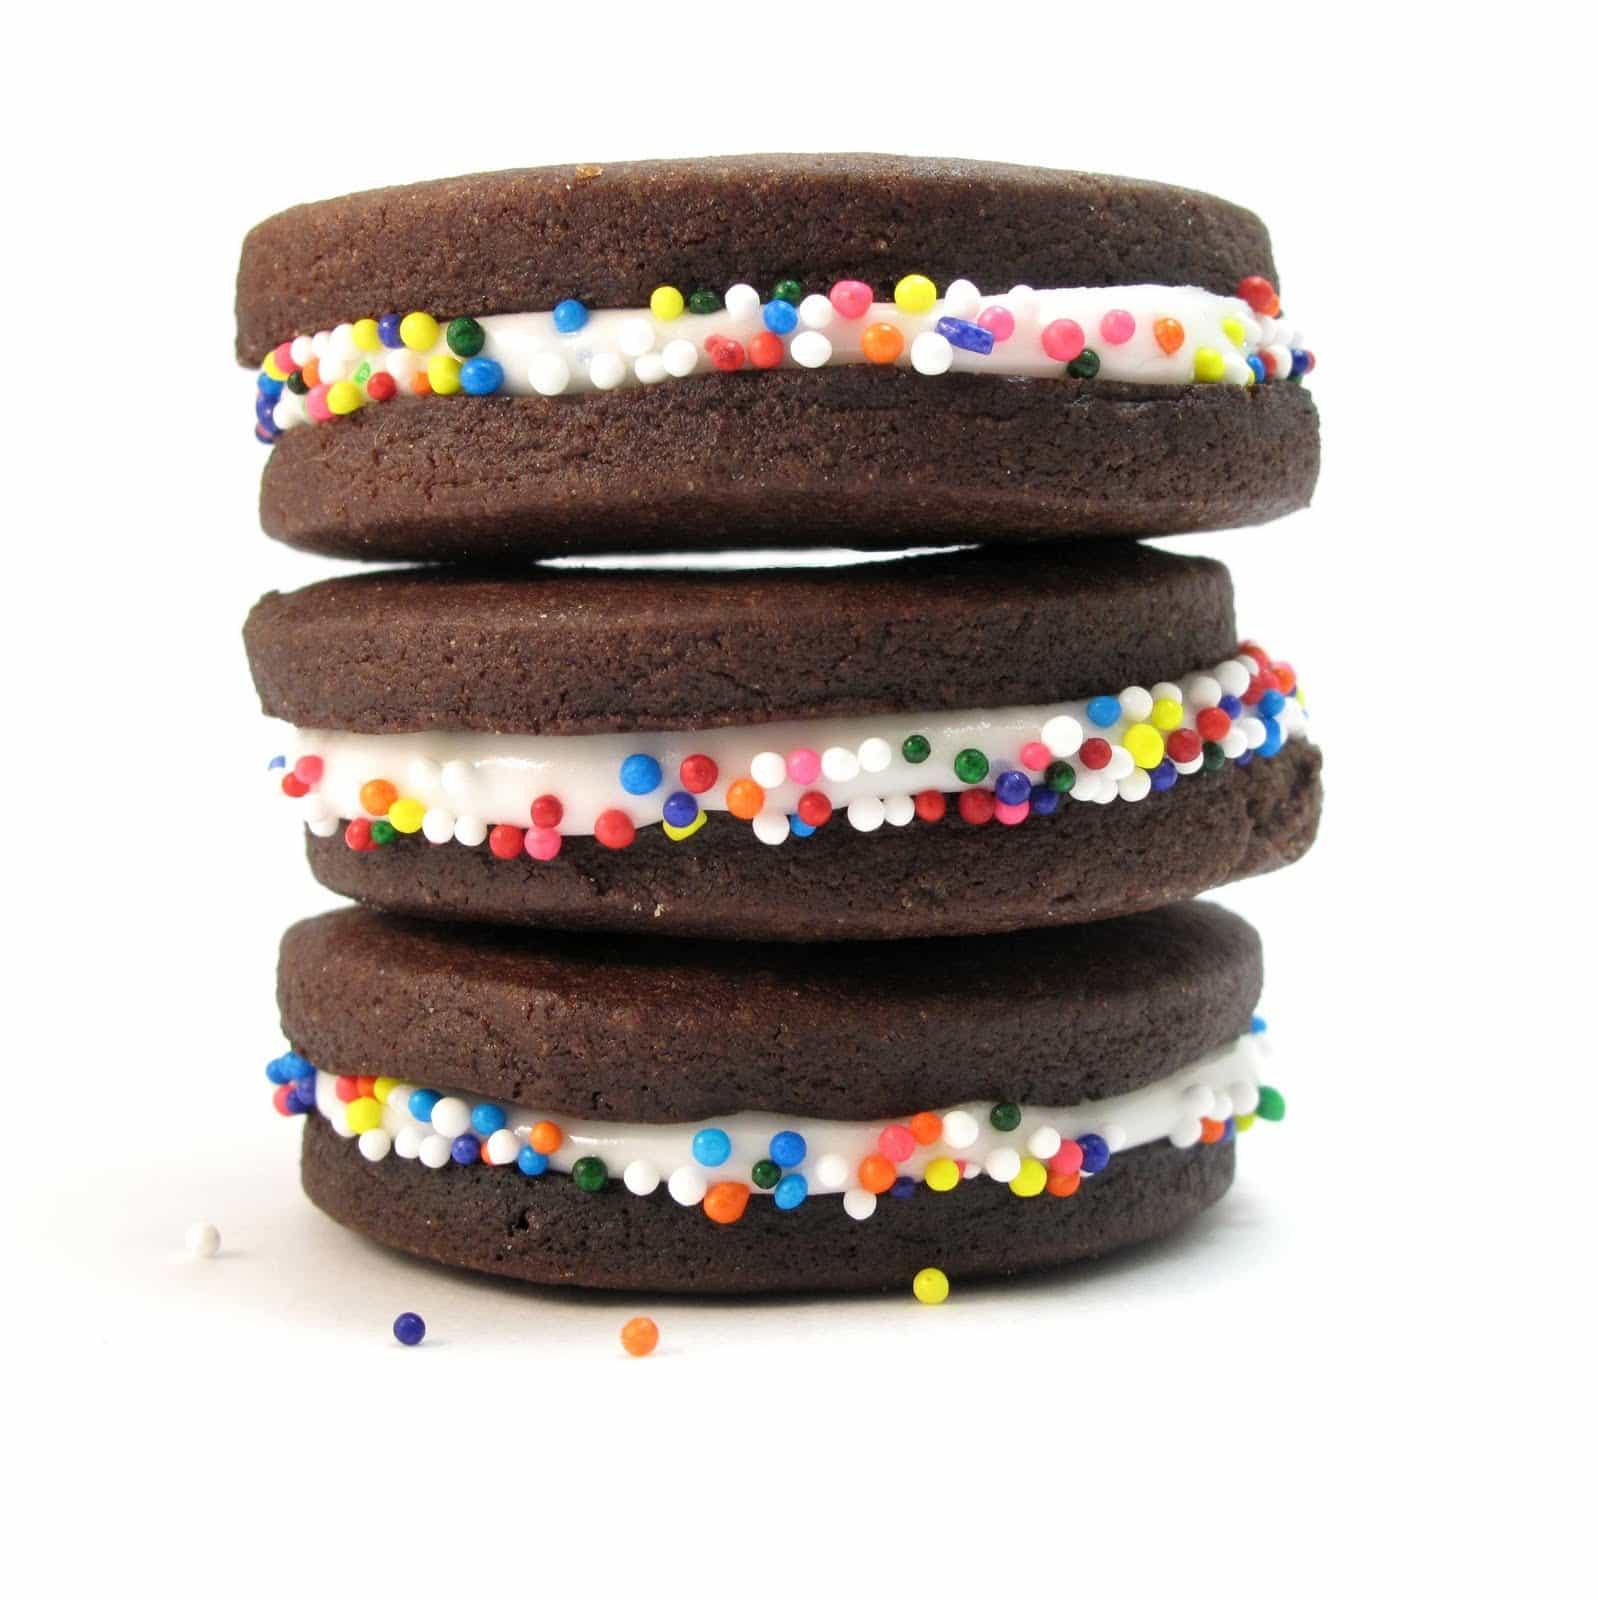 chocolate sprinkle sandwich cookies. maybe.